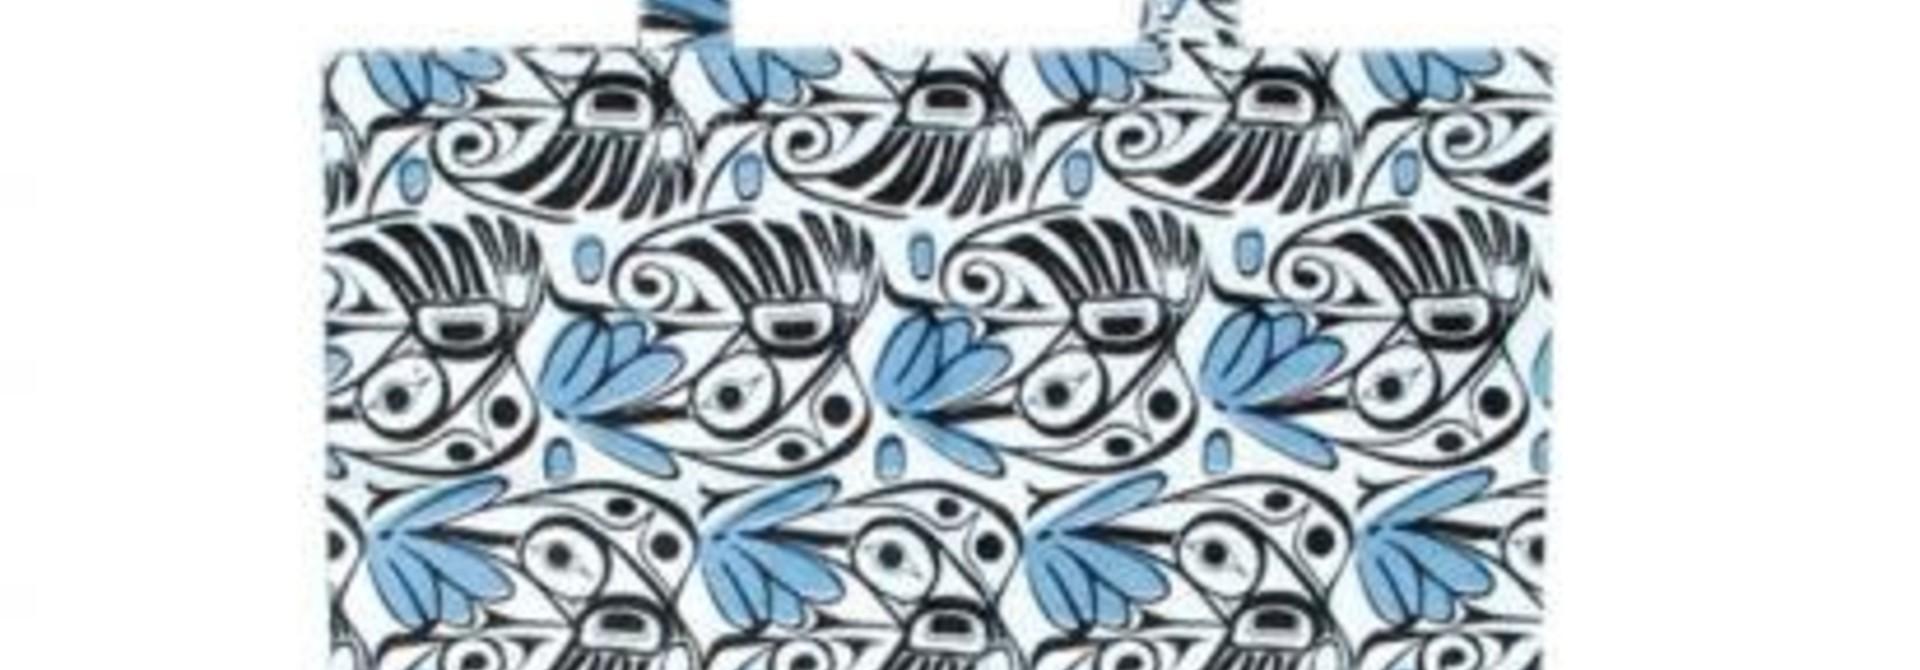 Cotton Shopping Bag -Hummingbird by Bill Helin